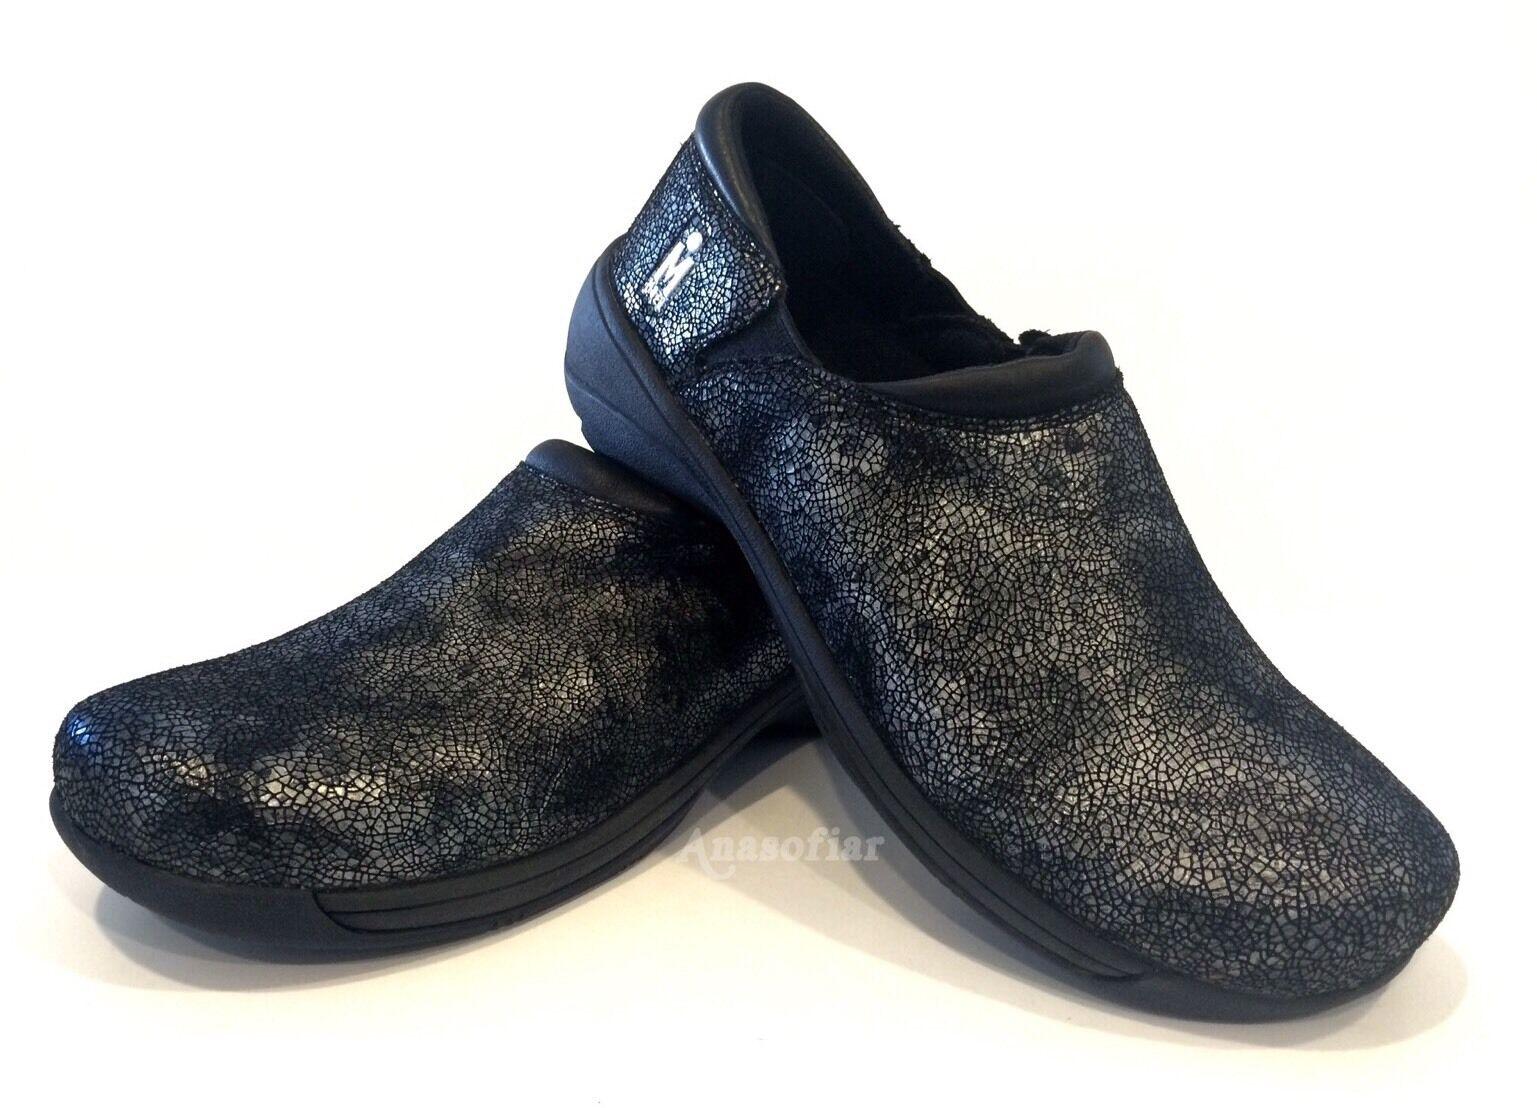 MOZO FORZA SWIRL WORK Schuhe WATER SLIP SLIP WATER RESISTANT LEATHER BLACK WOMEN'S US 11 a5394f